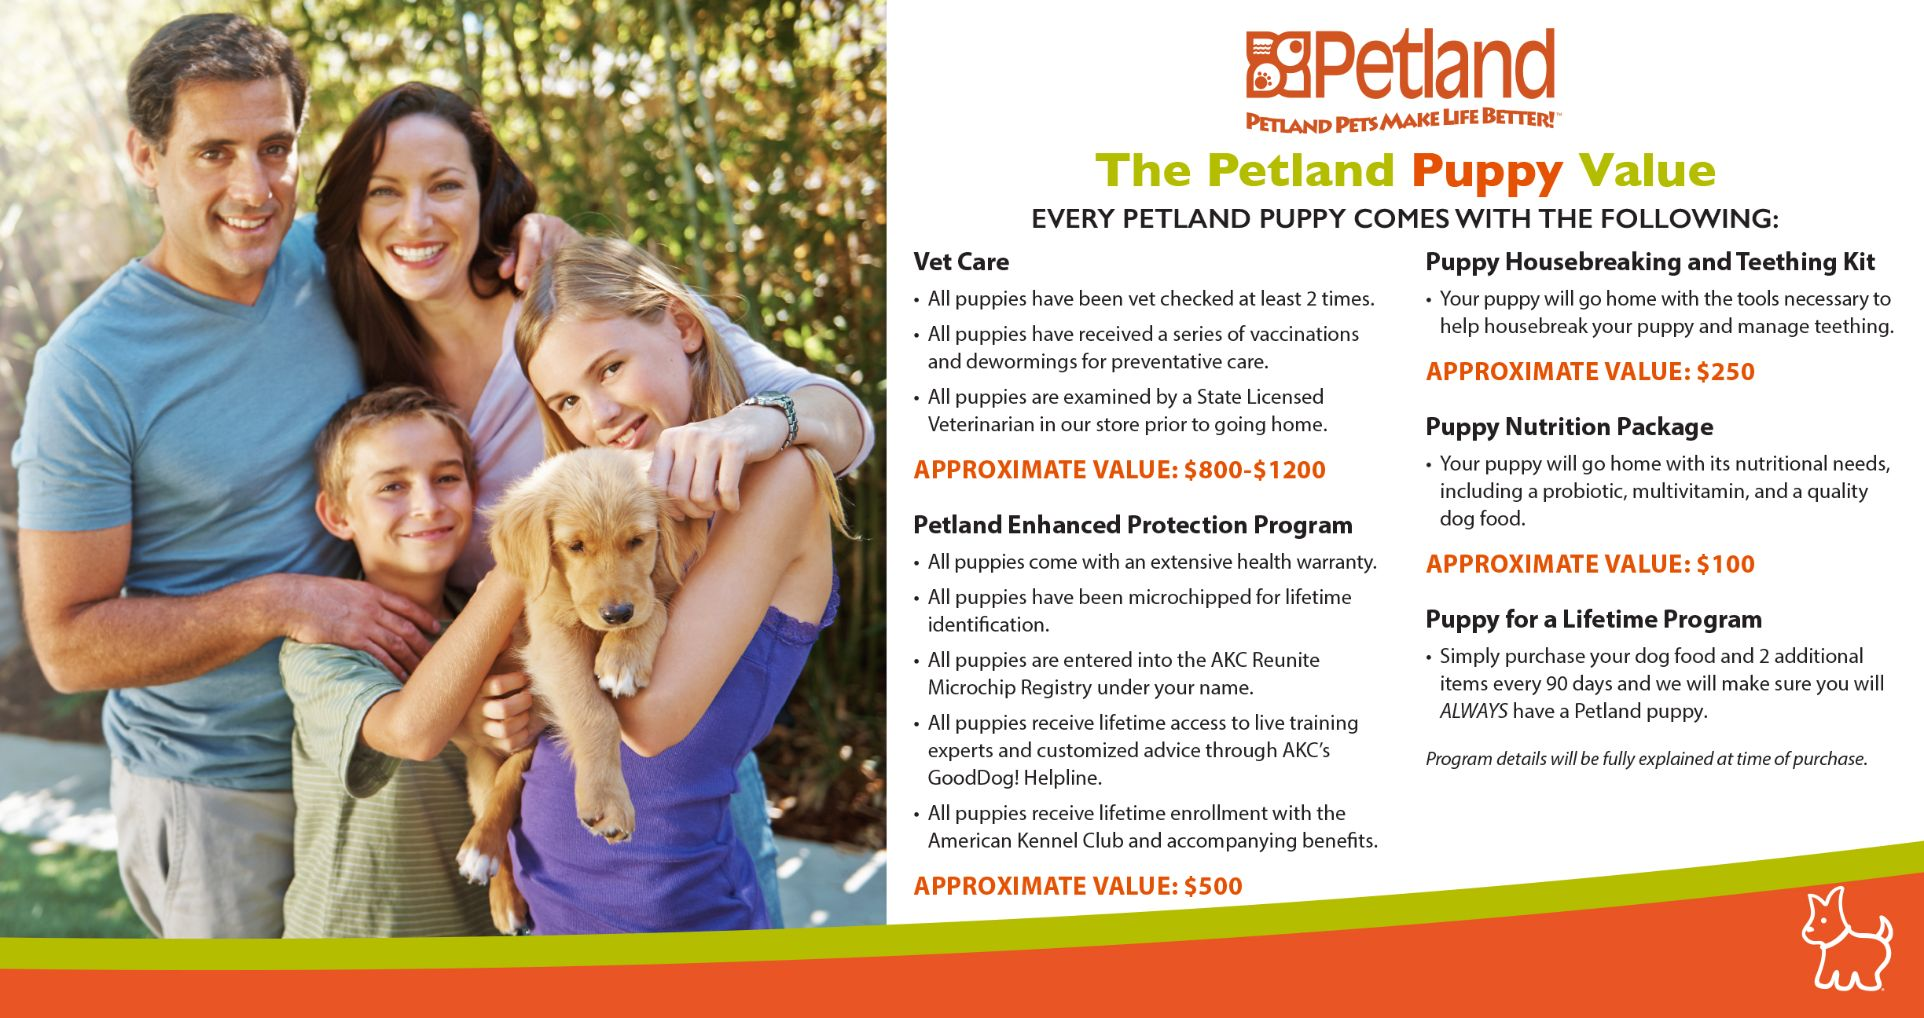 The Petland Puppy Value List